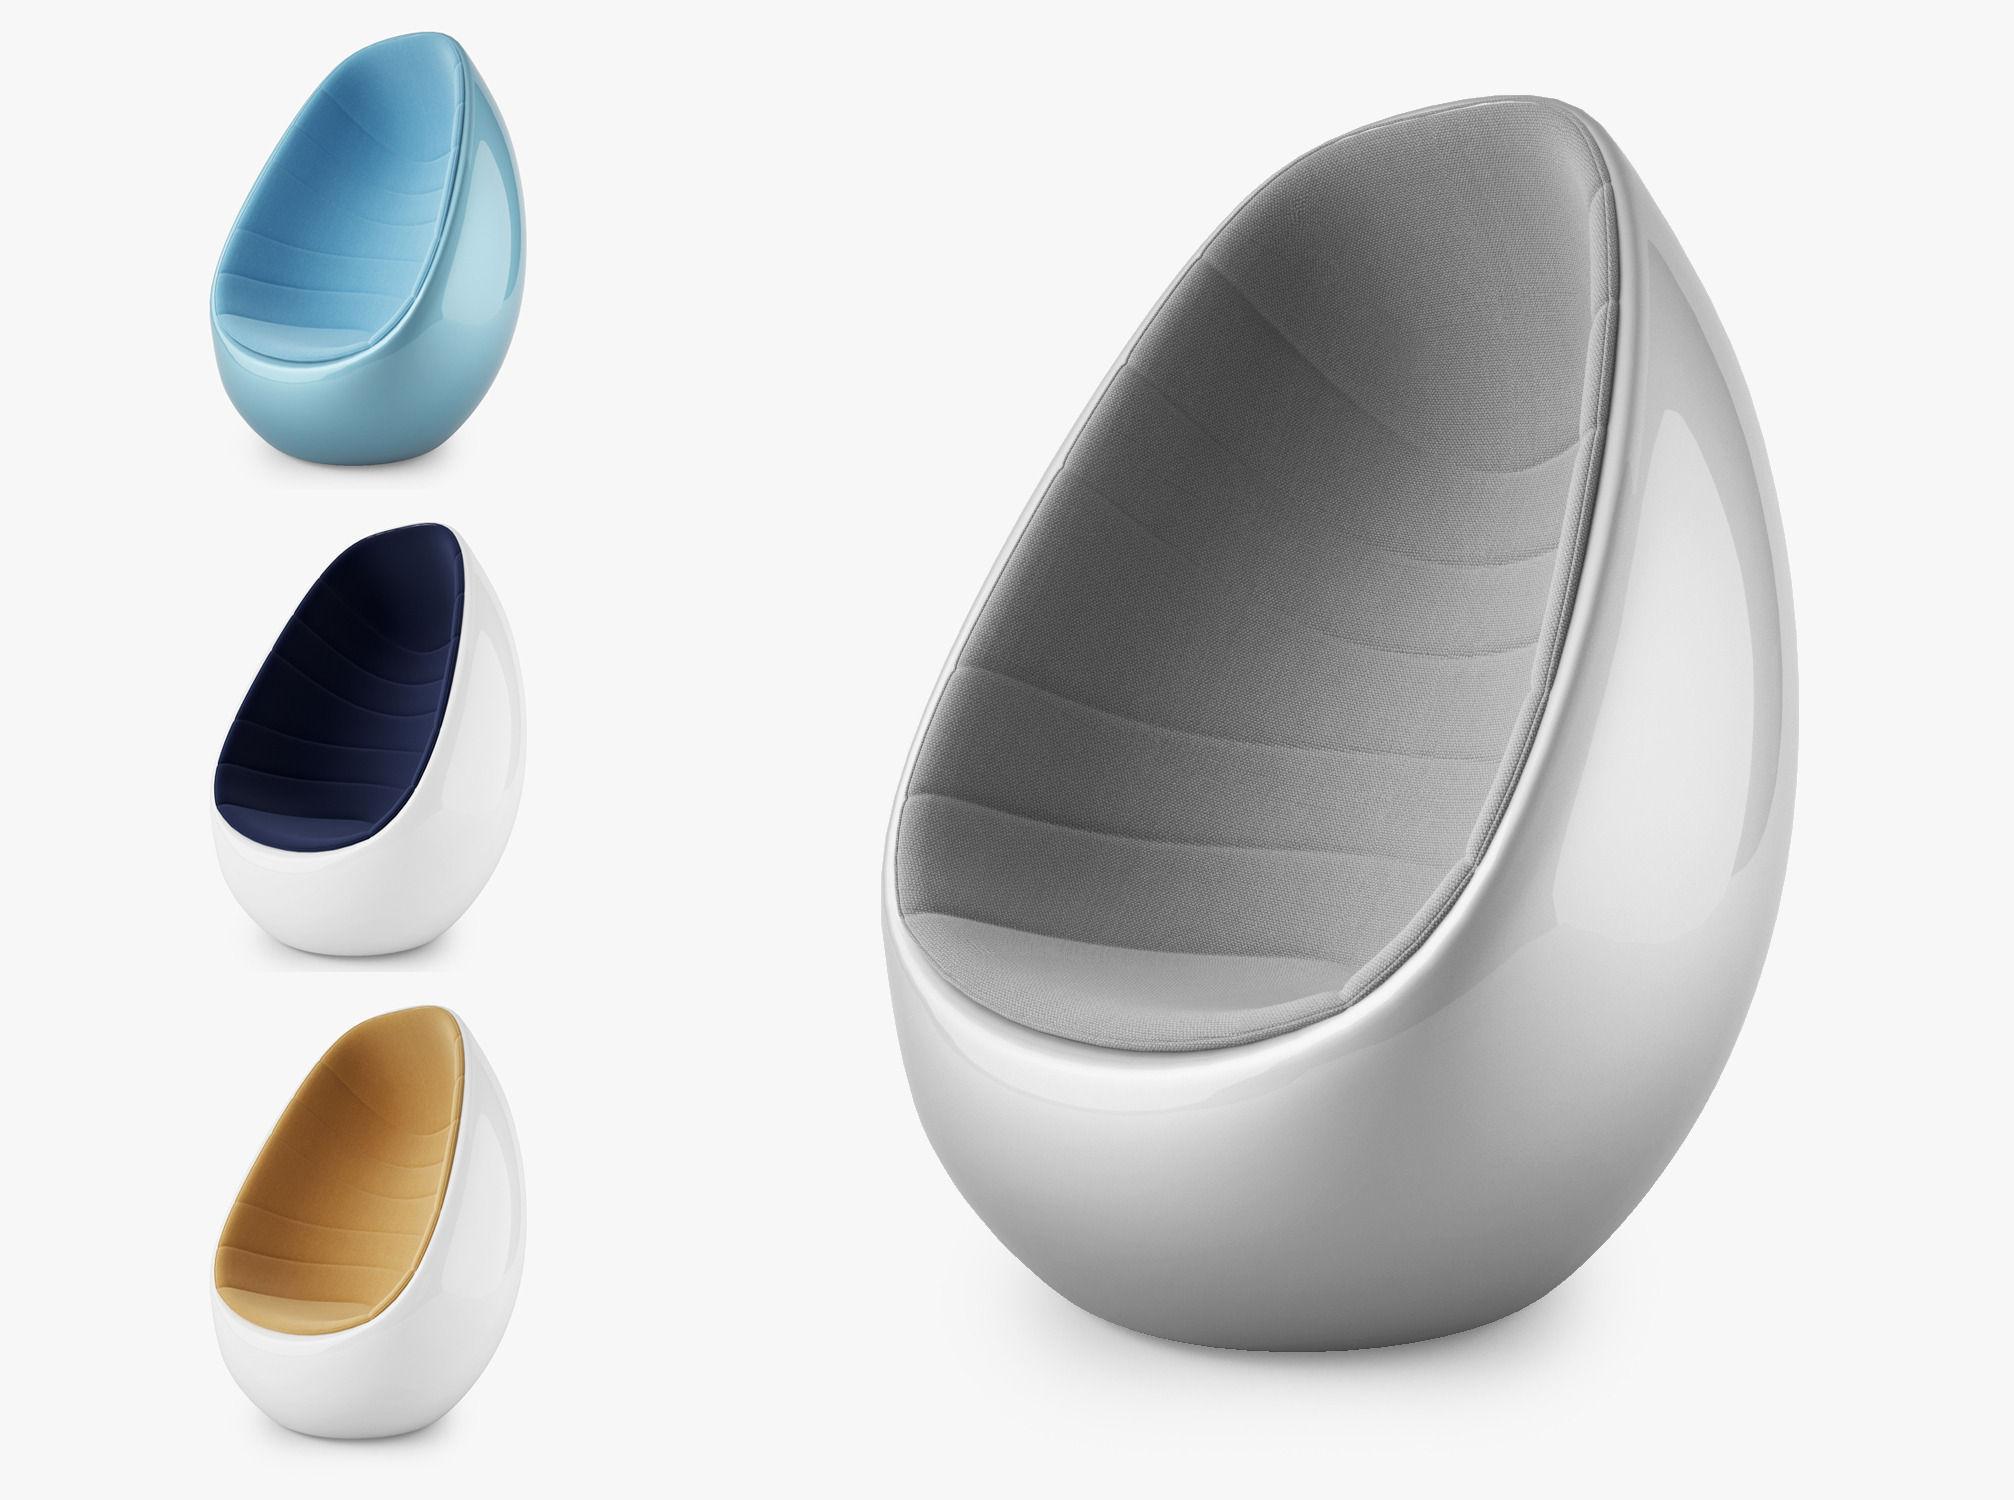 Martela Koop Chair Design By Rashid Karim 3d Model Max Obj Fbx Mtl 1